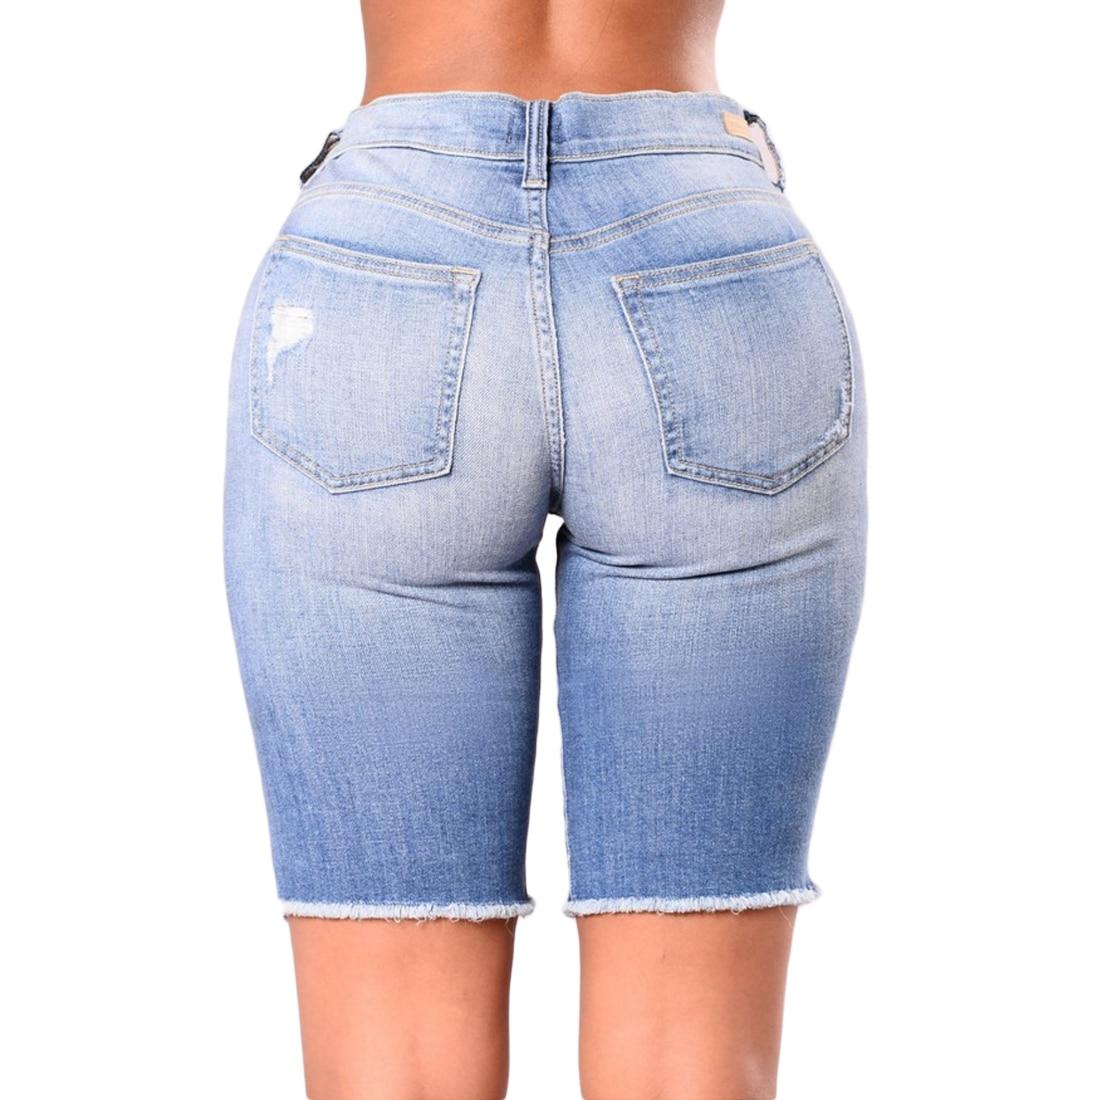 New Women Fashion High Waist Half Ripped Jeans Street Broken Slim Denim   Shorts   Half Trousers